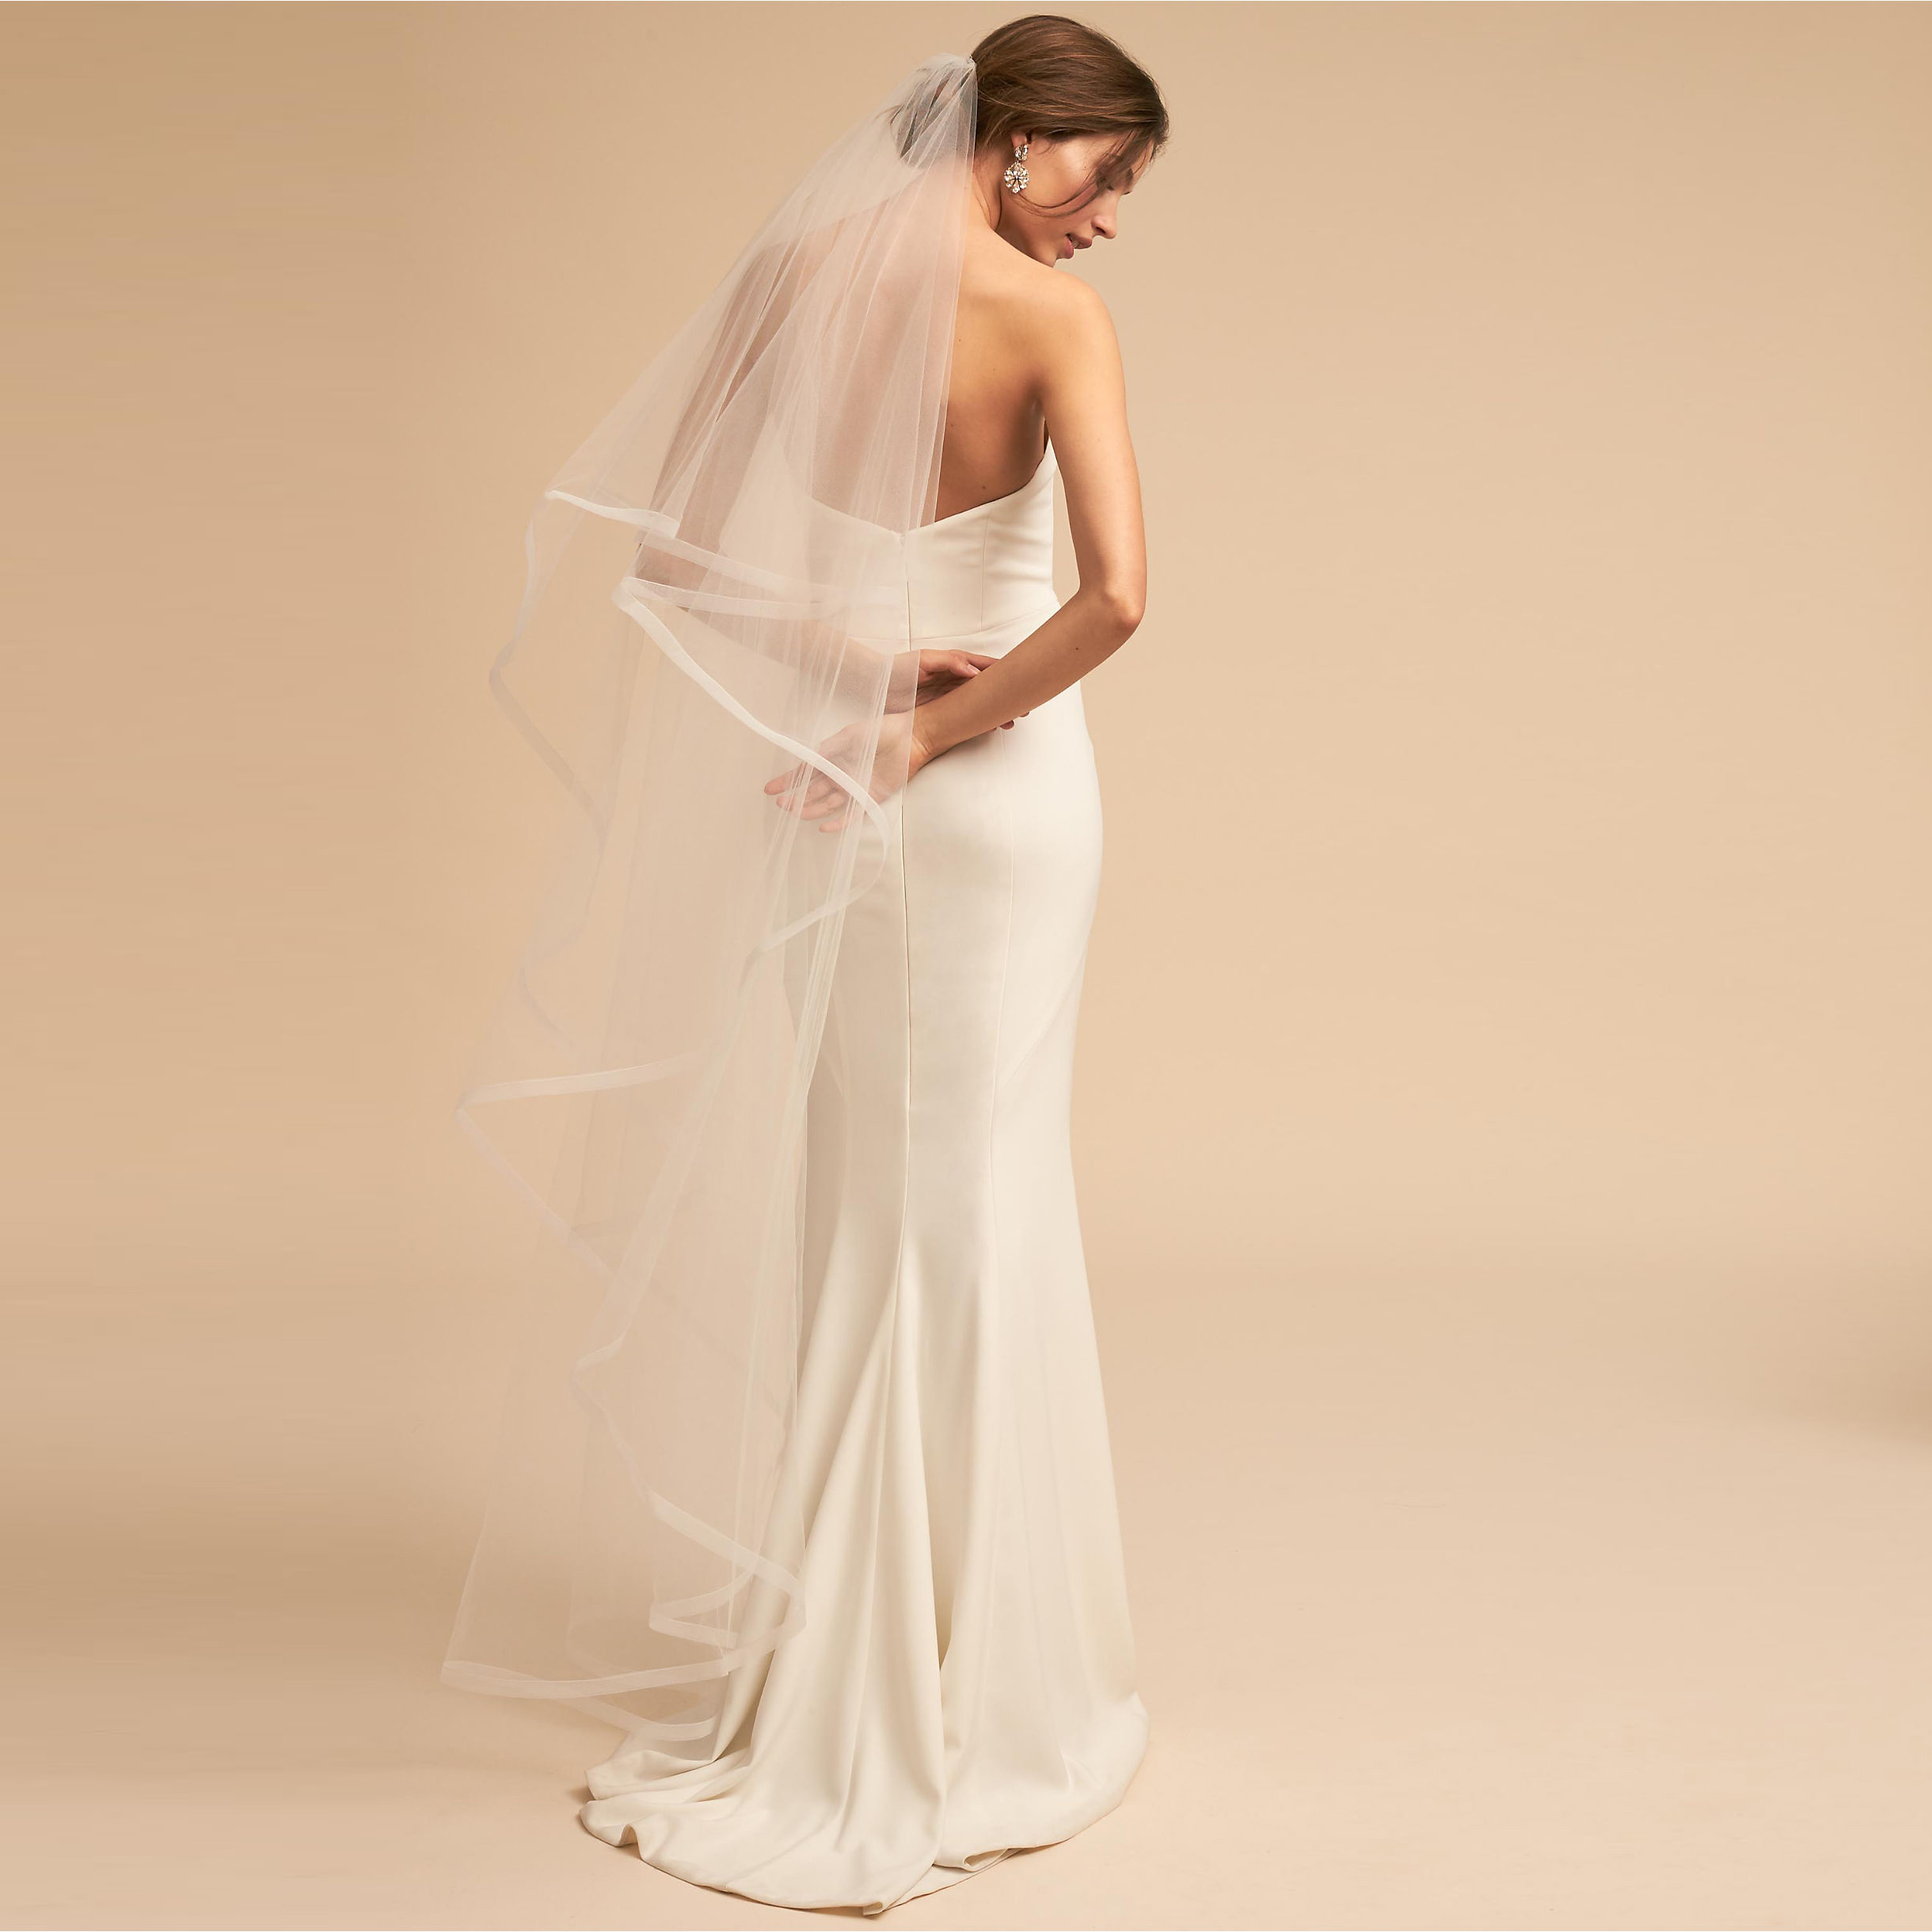 Simple Long Wedding Veil 2019 Two Layer Bridal Tulle Veils with Comb Wedding Accessories velo de novia largo